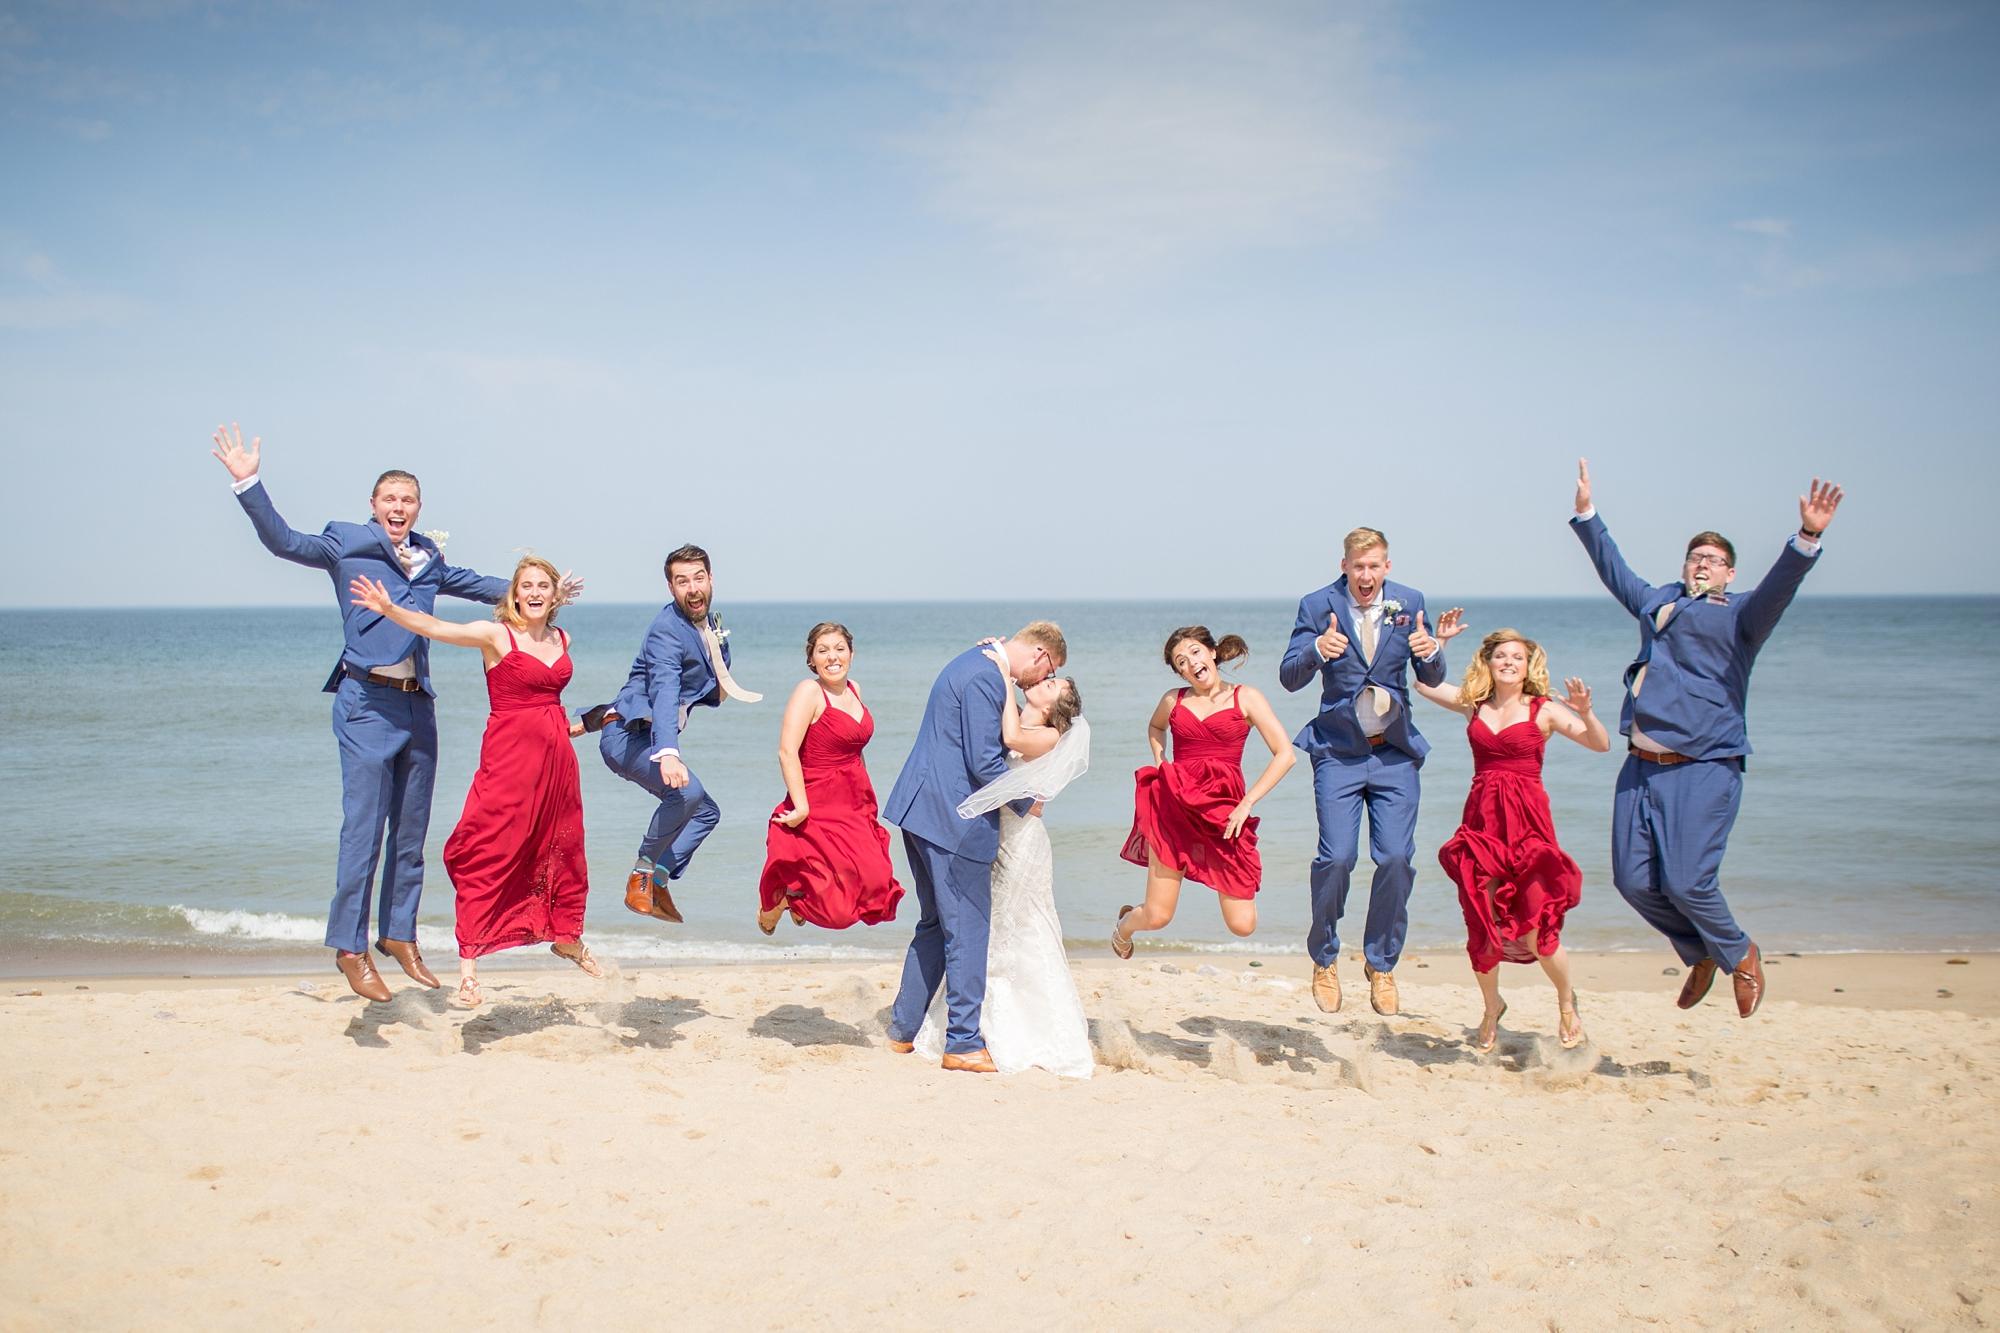 Goodman 4-Bridal Party-422_anna grace photography wellfleet cape cod massachusetts destination wedding photographer Chequessett Yacht and Country Club wedding photo.jpg